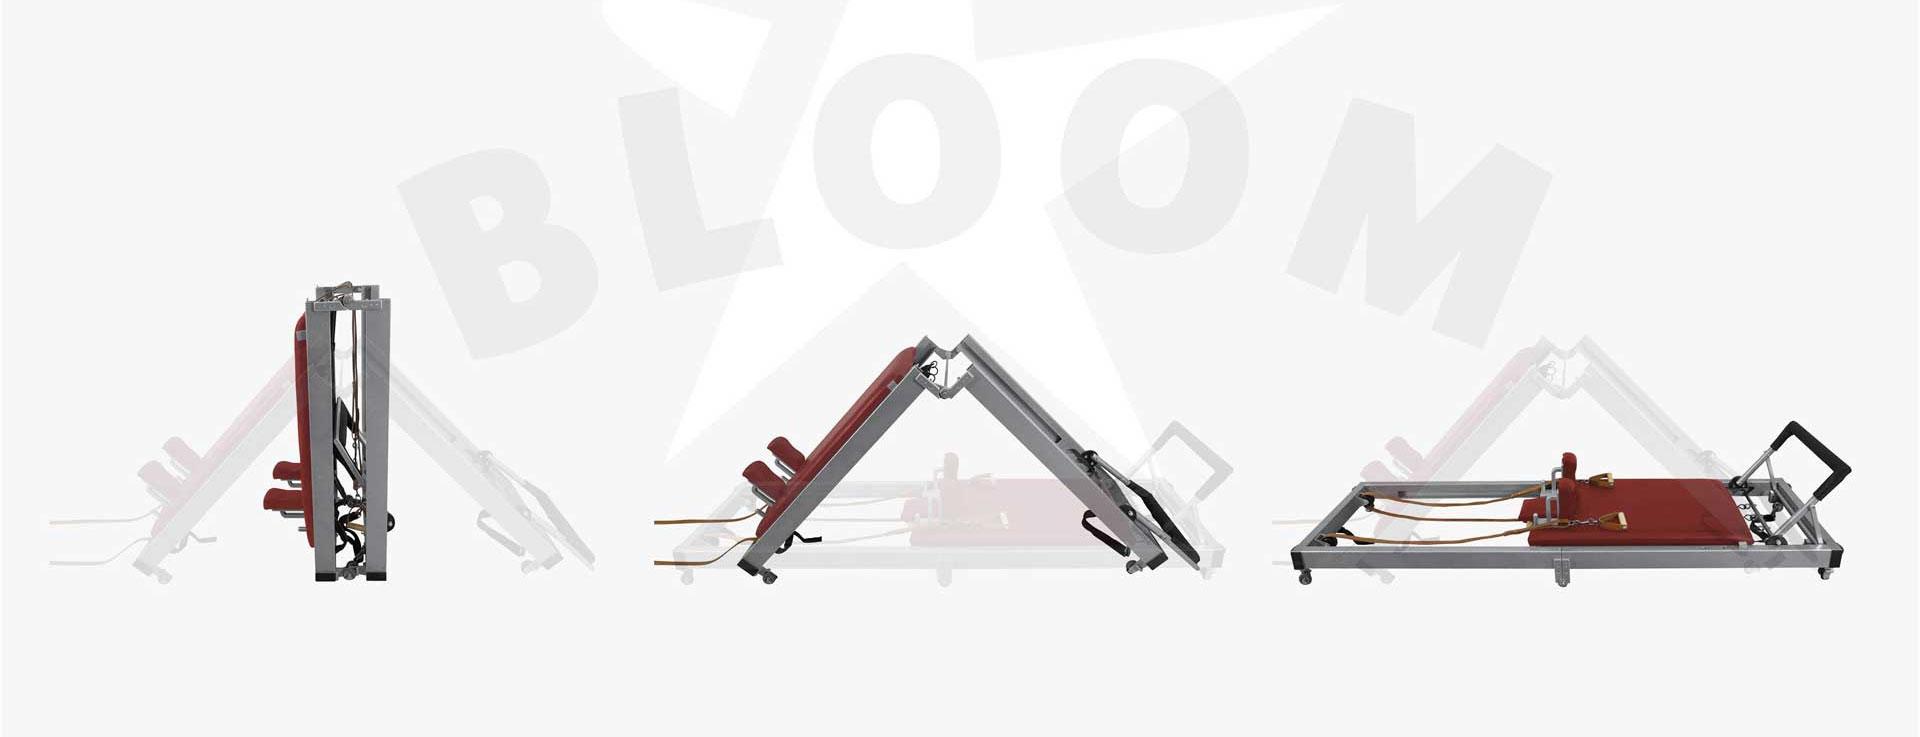 Folding Classical reformer - pilates equipment